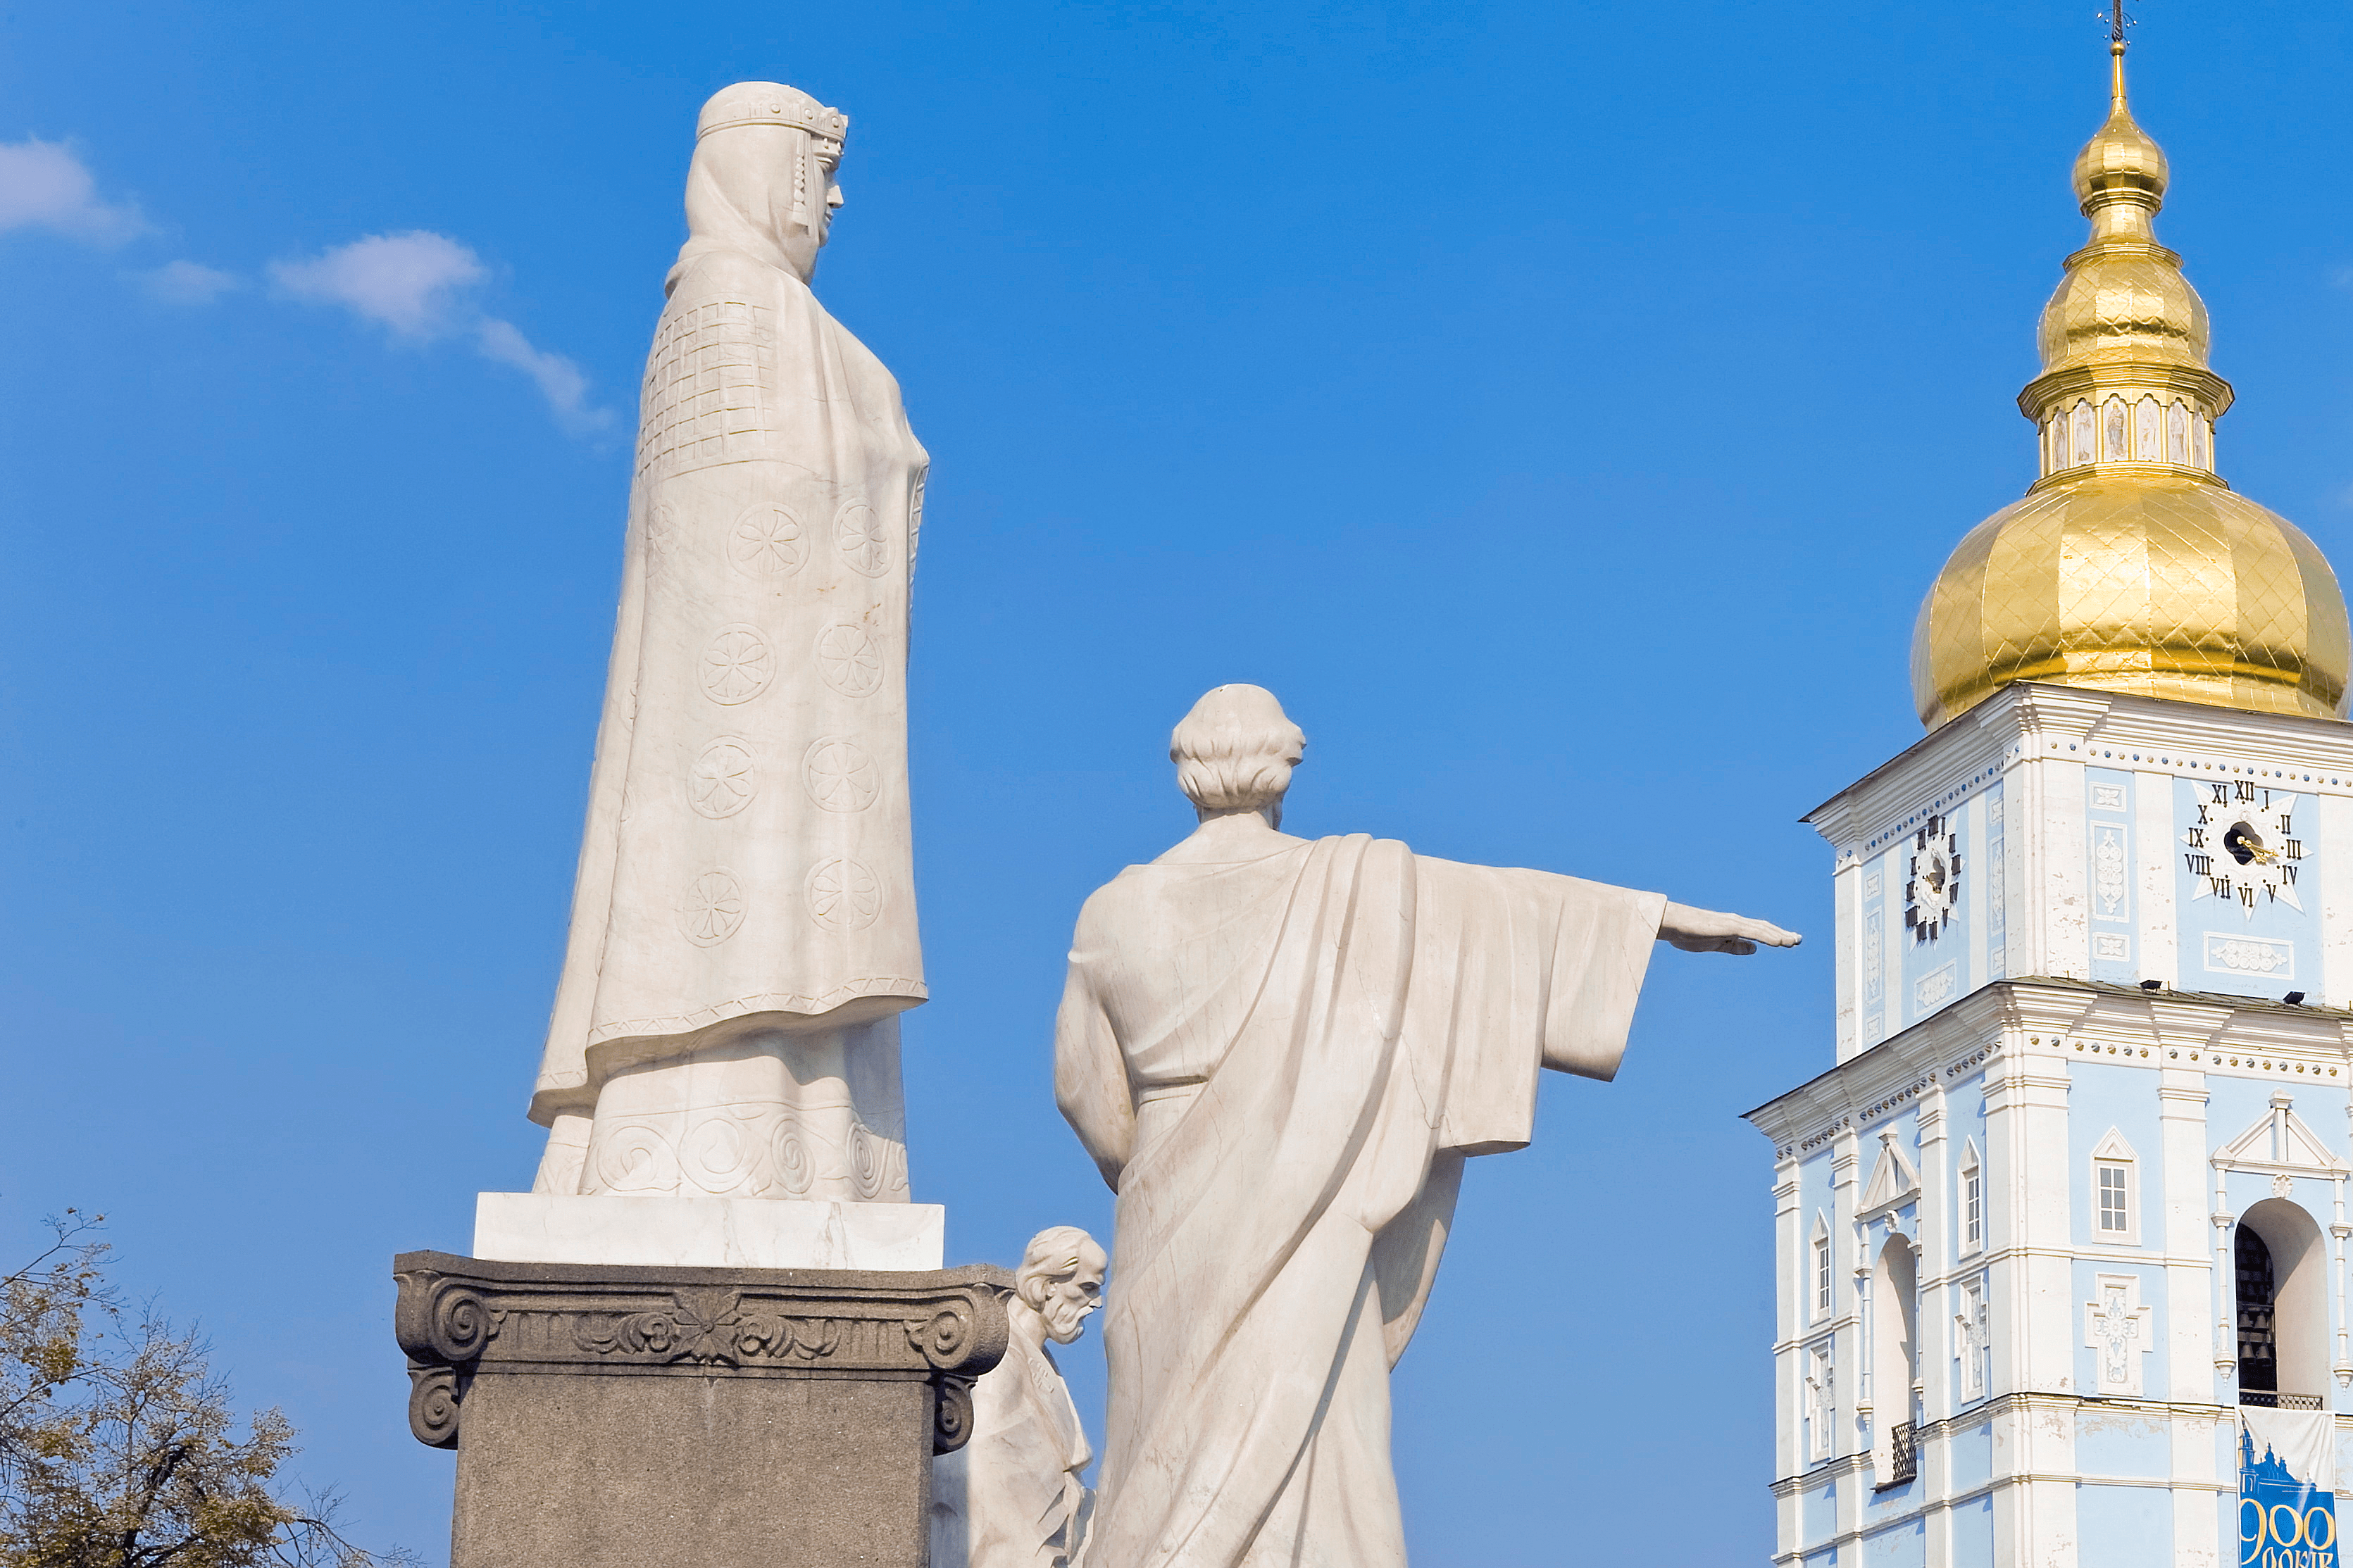 Monument to Olha (Olga) in front of monastery, Ukraine